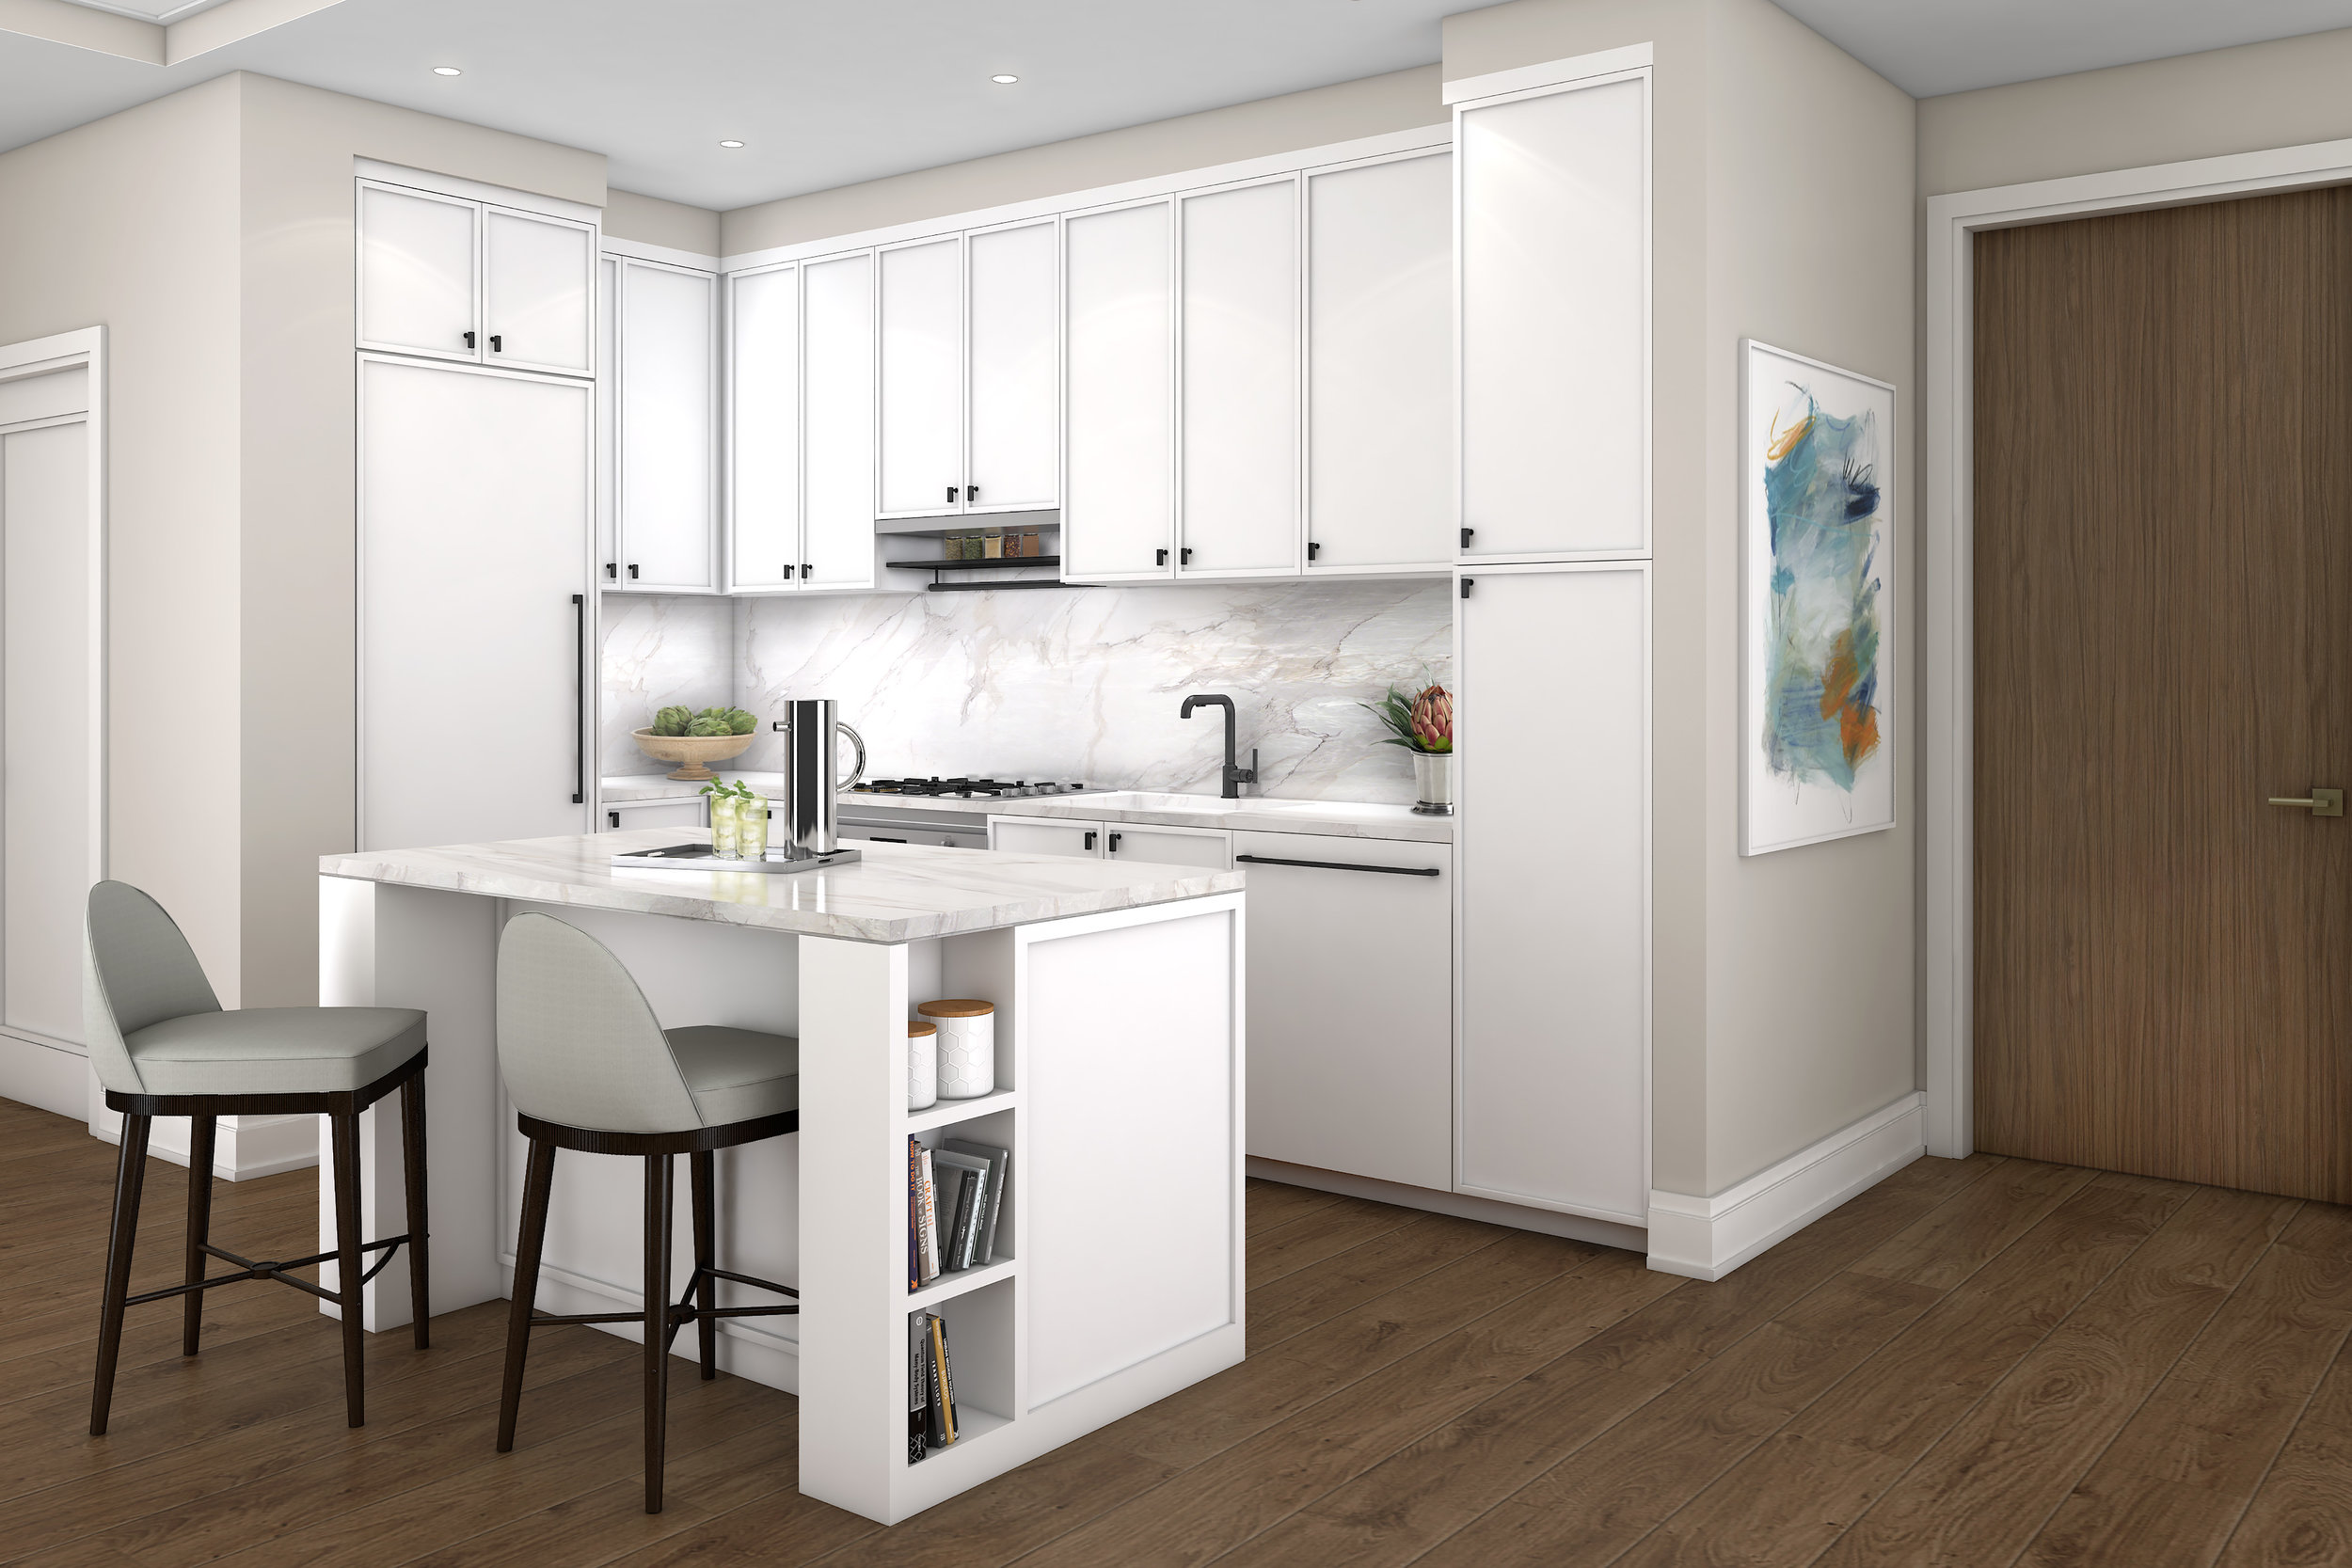 09 Unit 406 Kitchen 2018.jpg